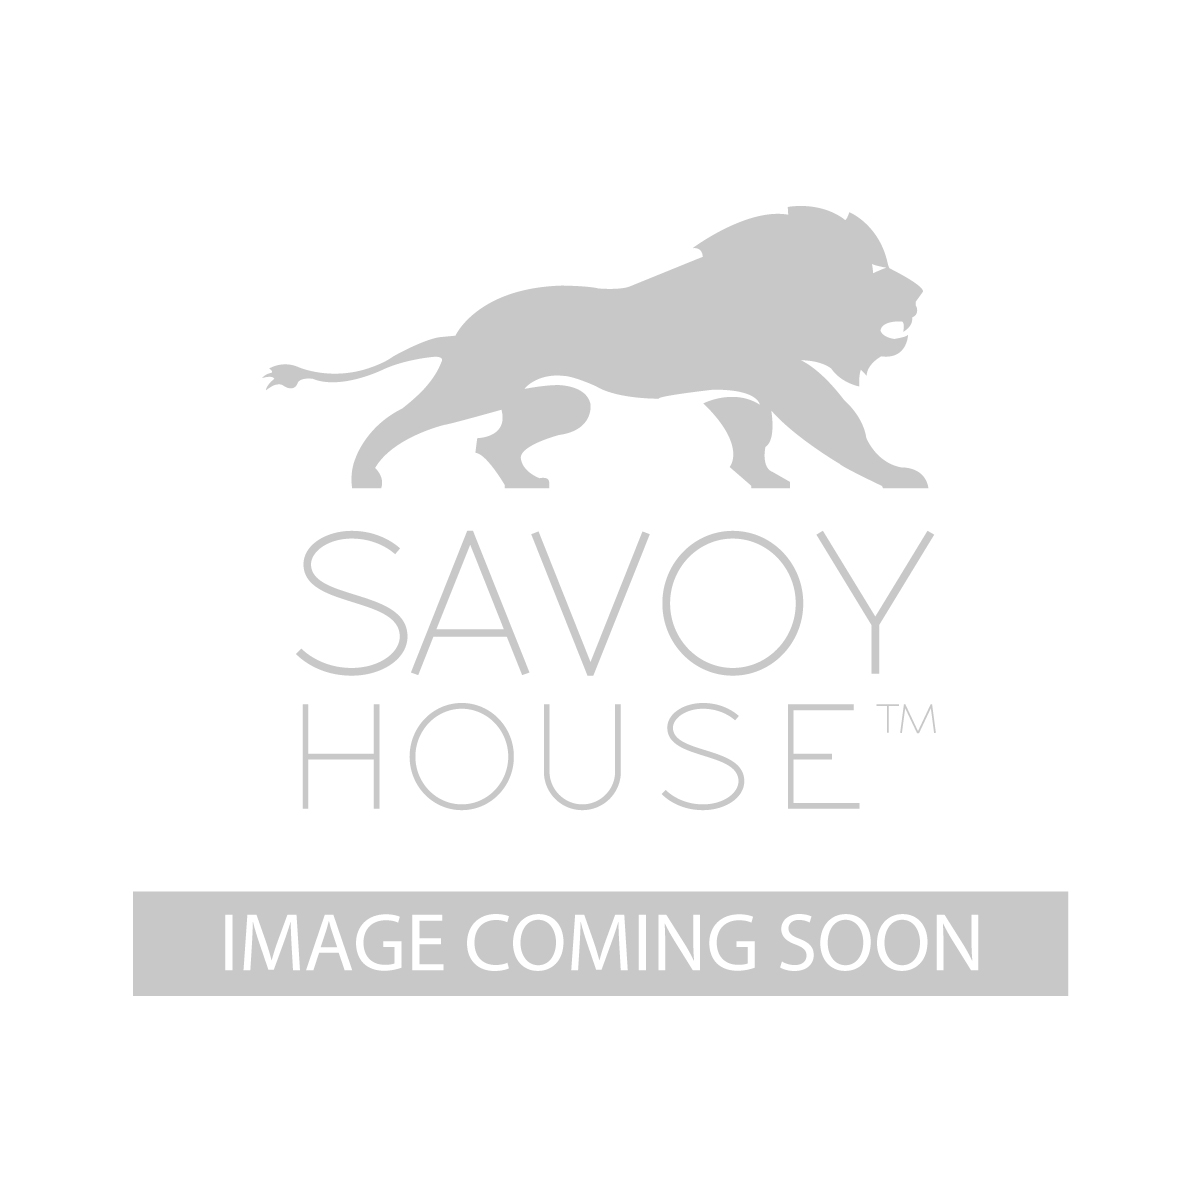 3p 80200 3 69 Entry Lantern Foyer 3 Light By Savoy House